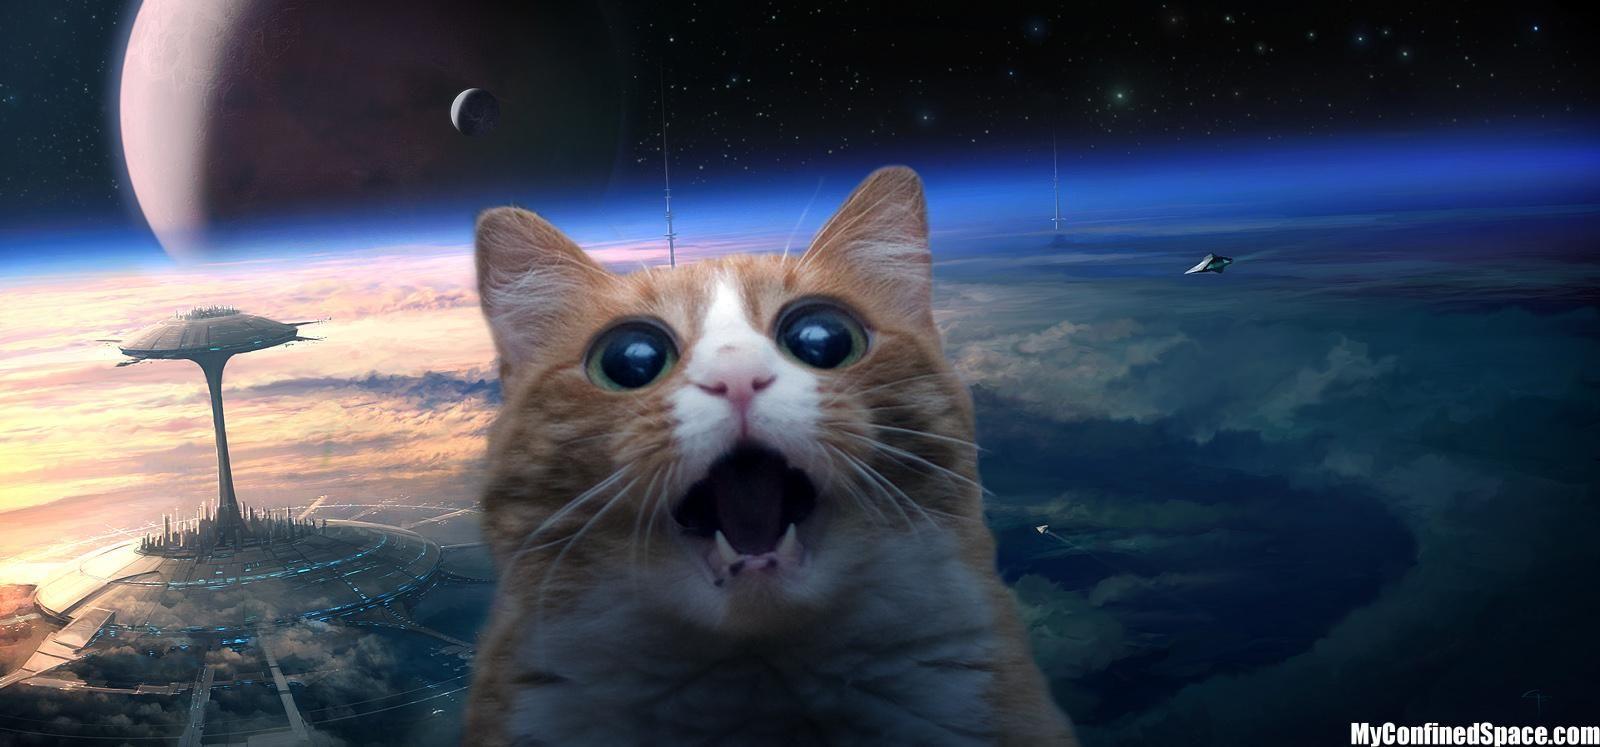 favorite. cats/space Pinterest Love